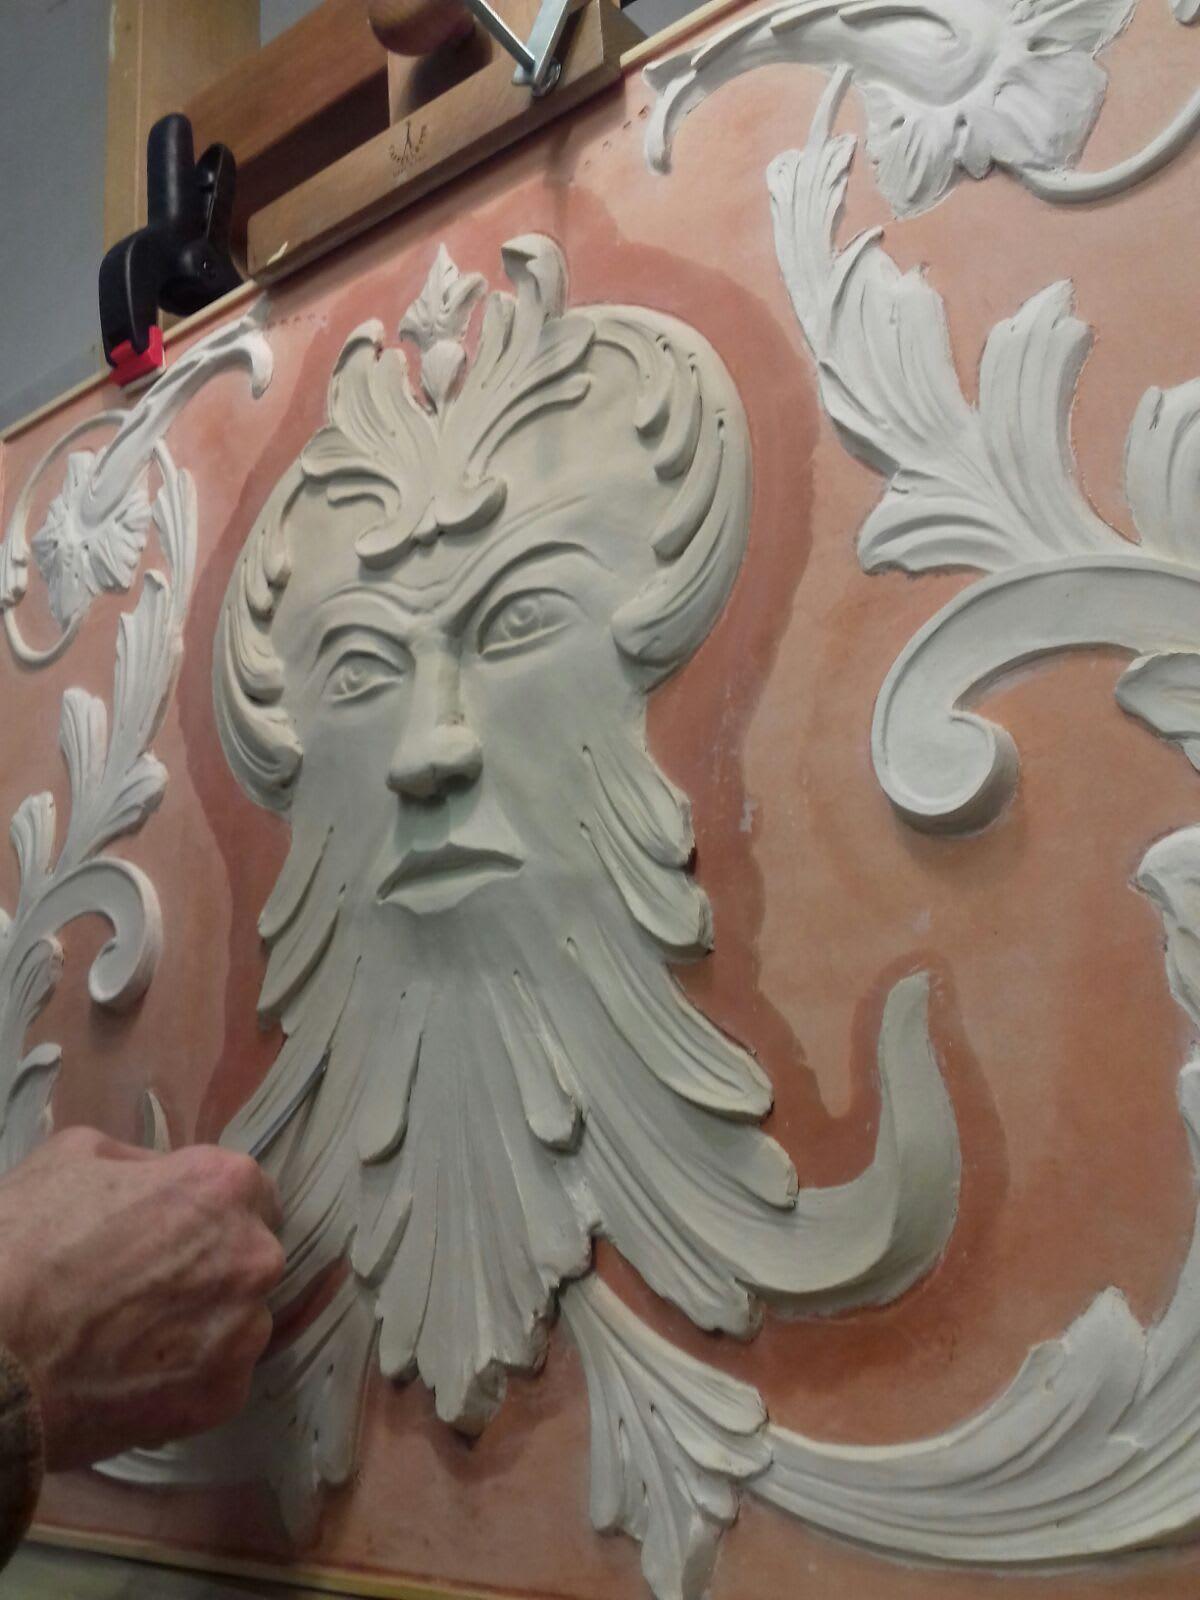 bas-relief-sculpture-material-marmorino-mascherone-pigmentti